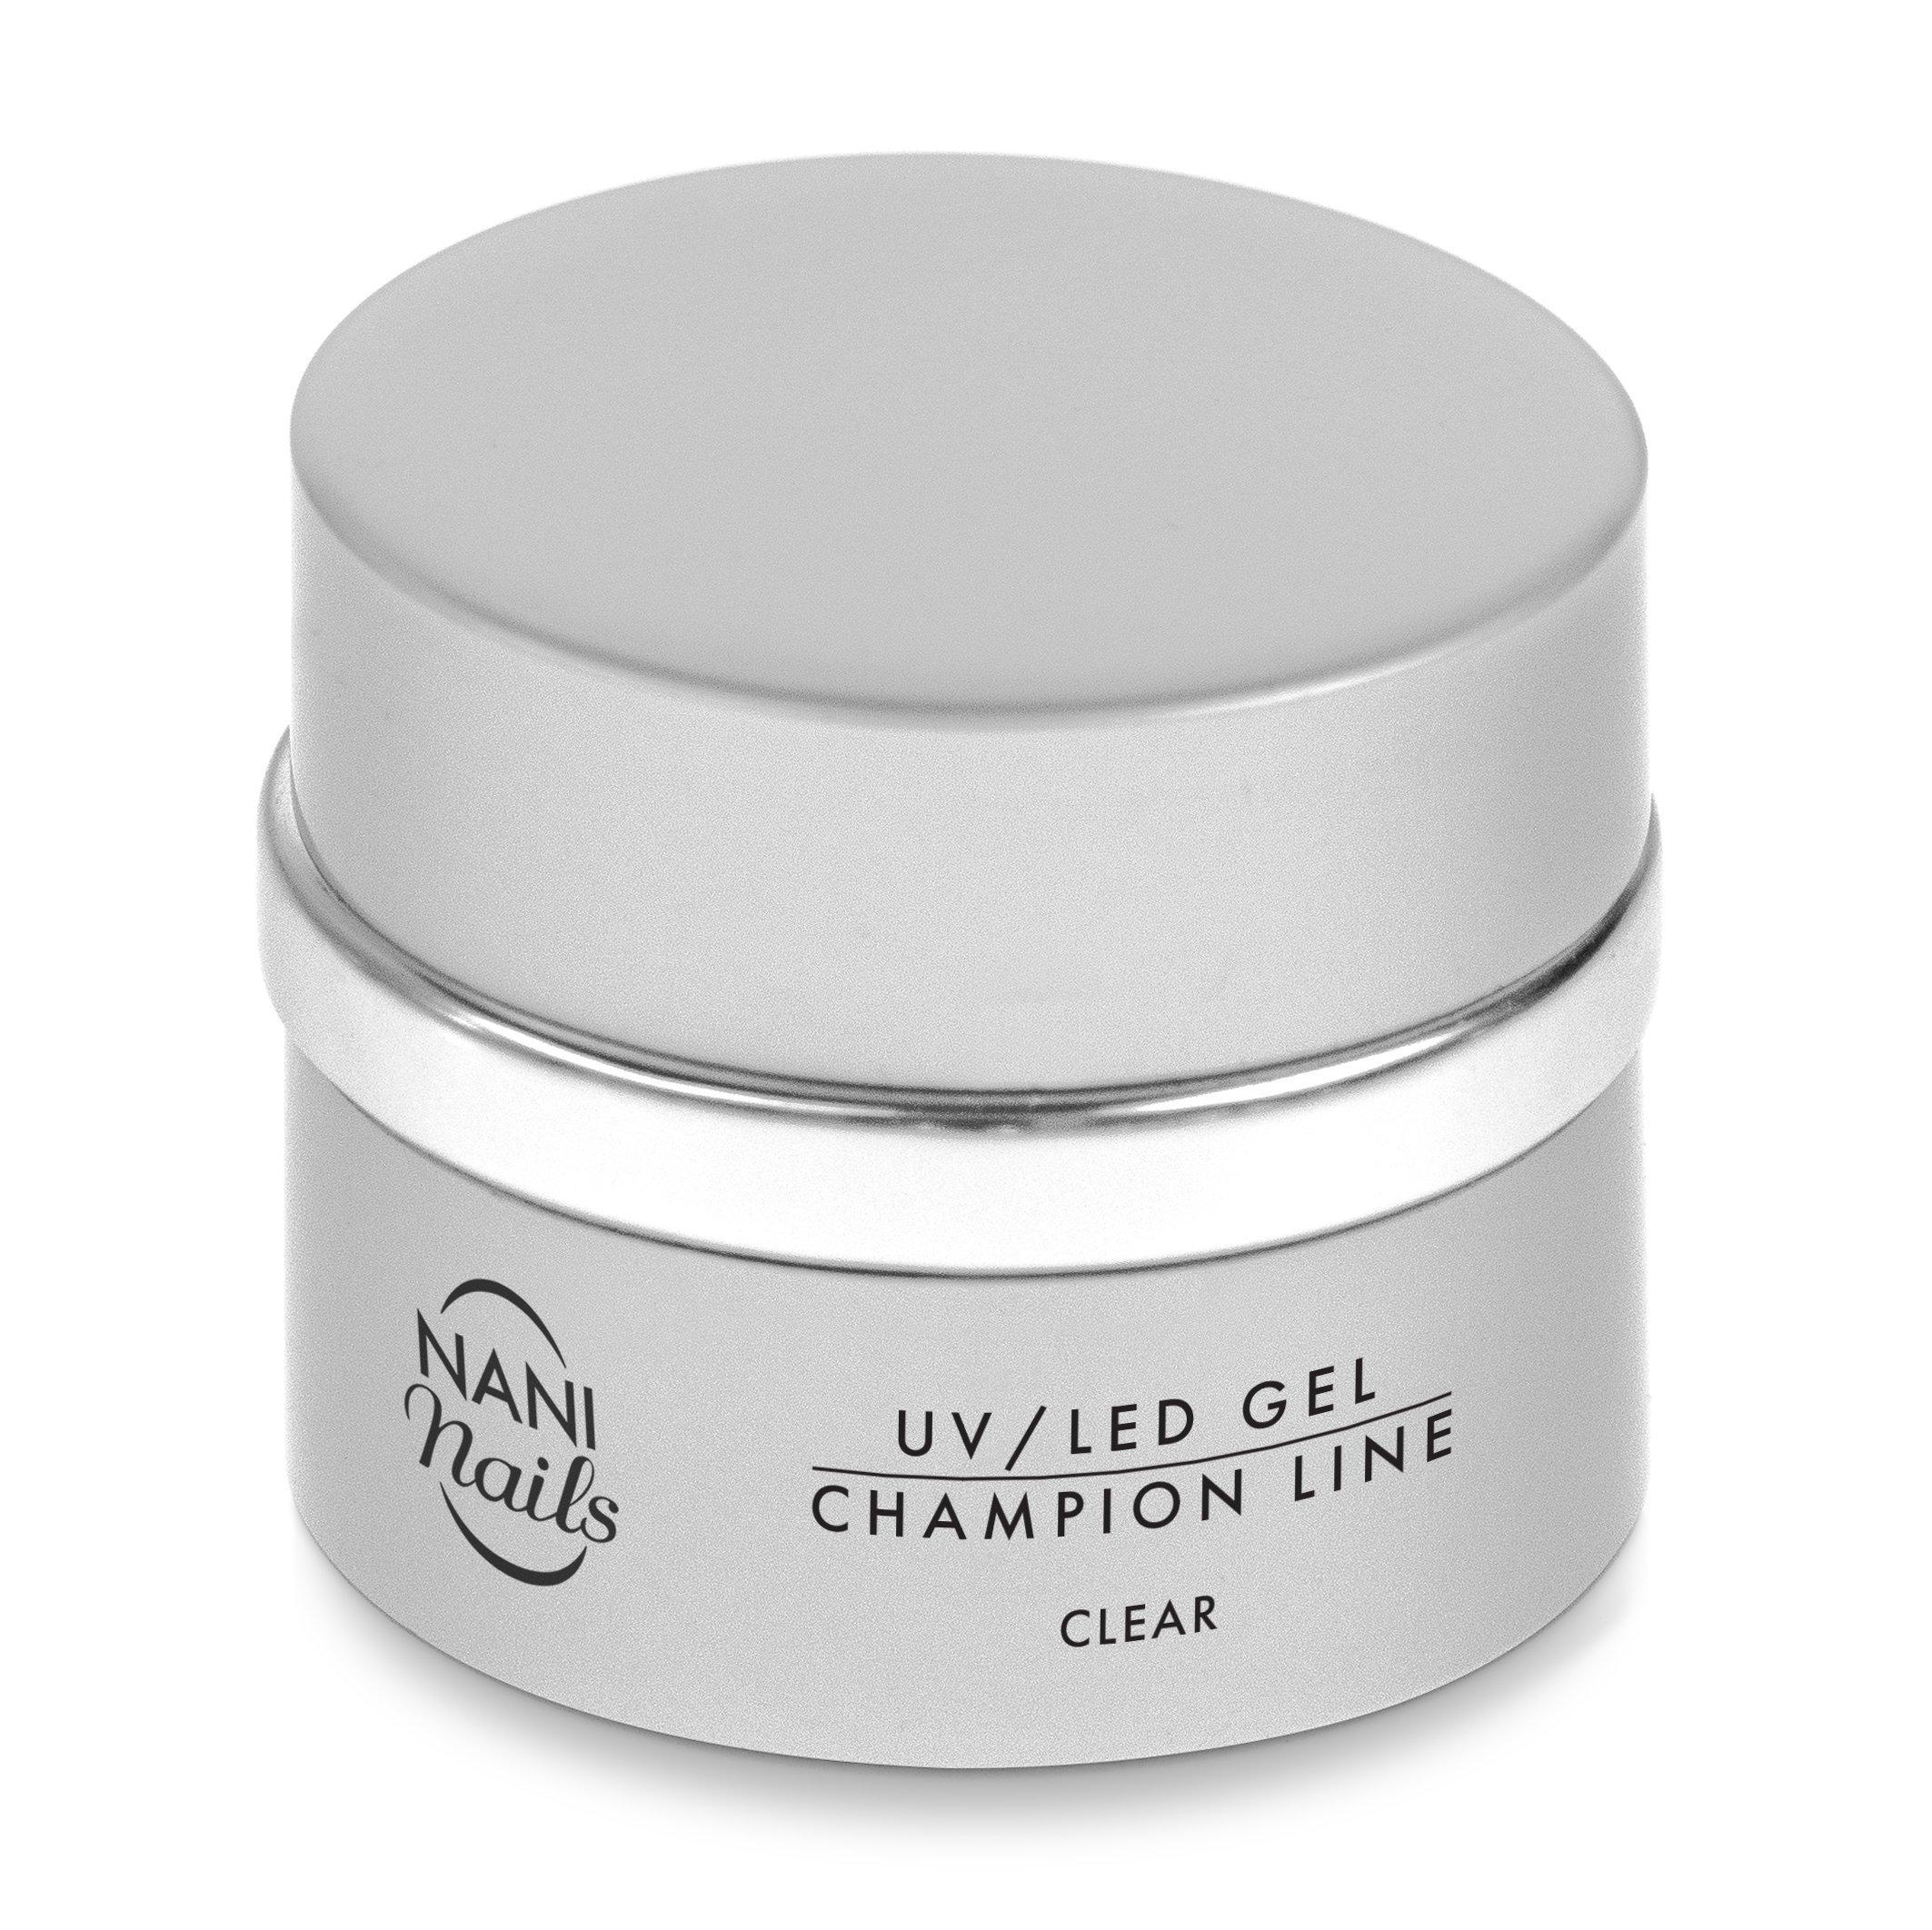 NANI UV/LED gél Champion Line 5 ml - Clear